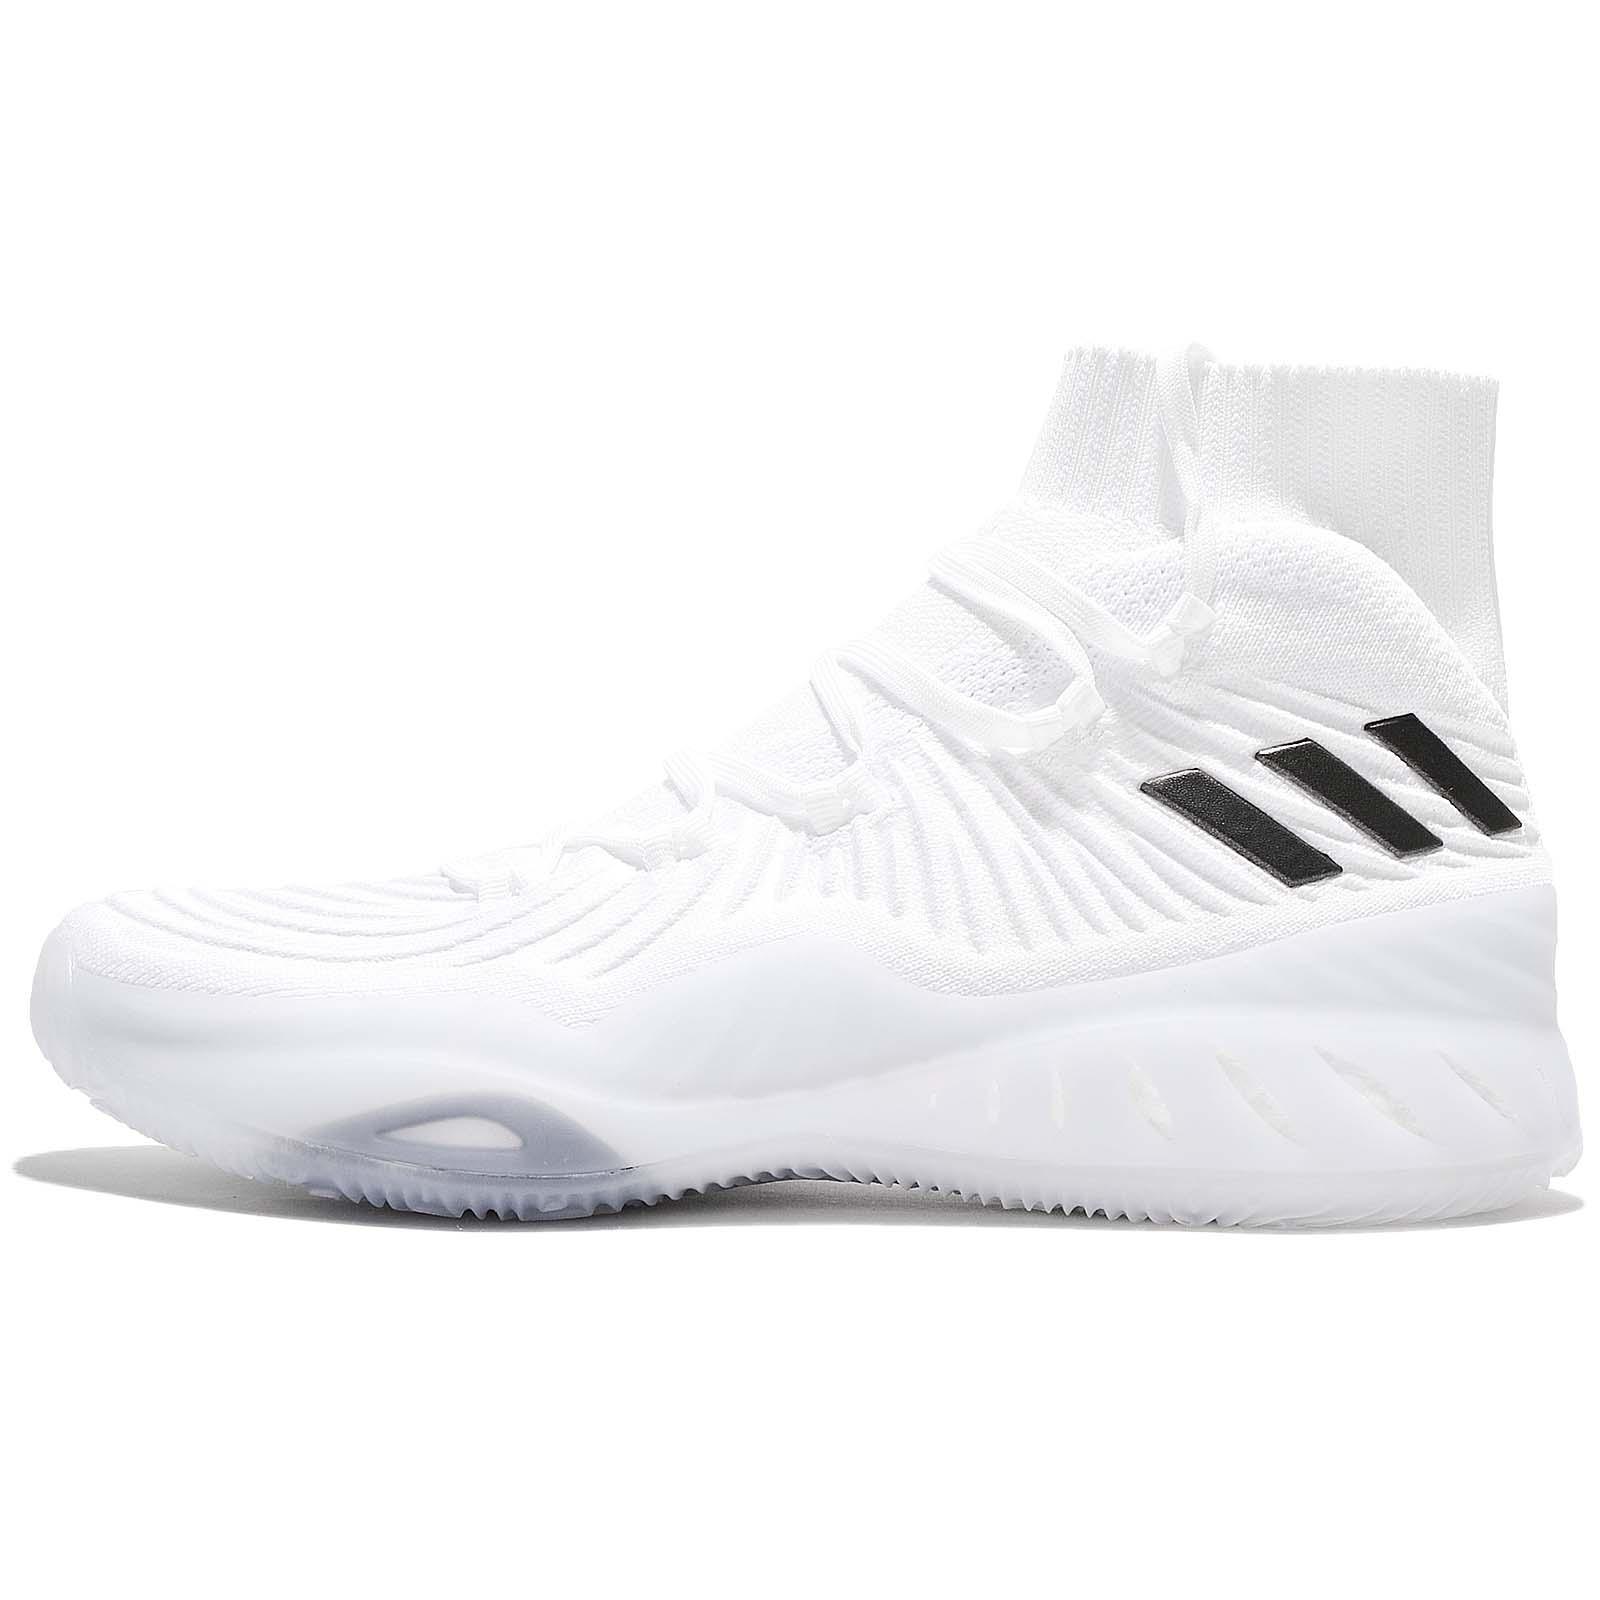 Adidas Explosiva Blanco Pk 2,017 Loca